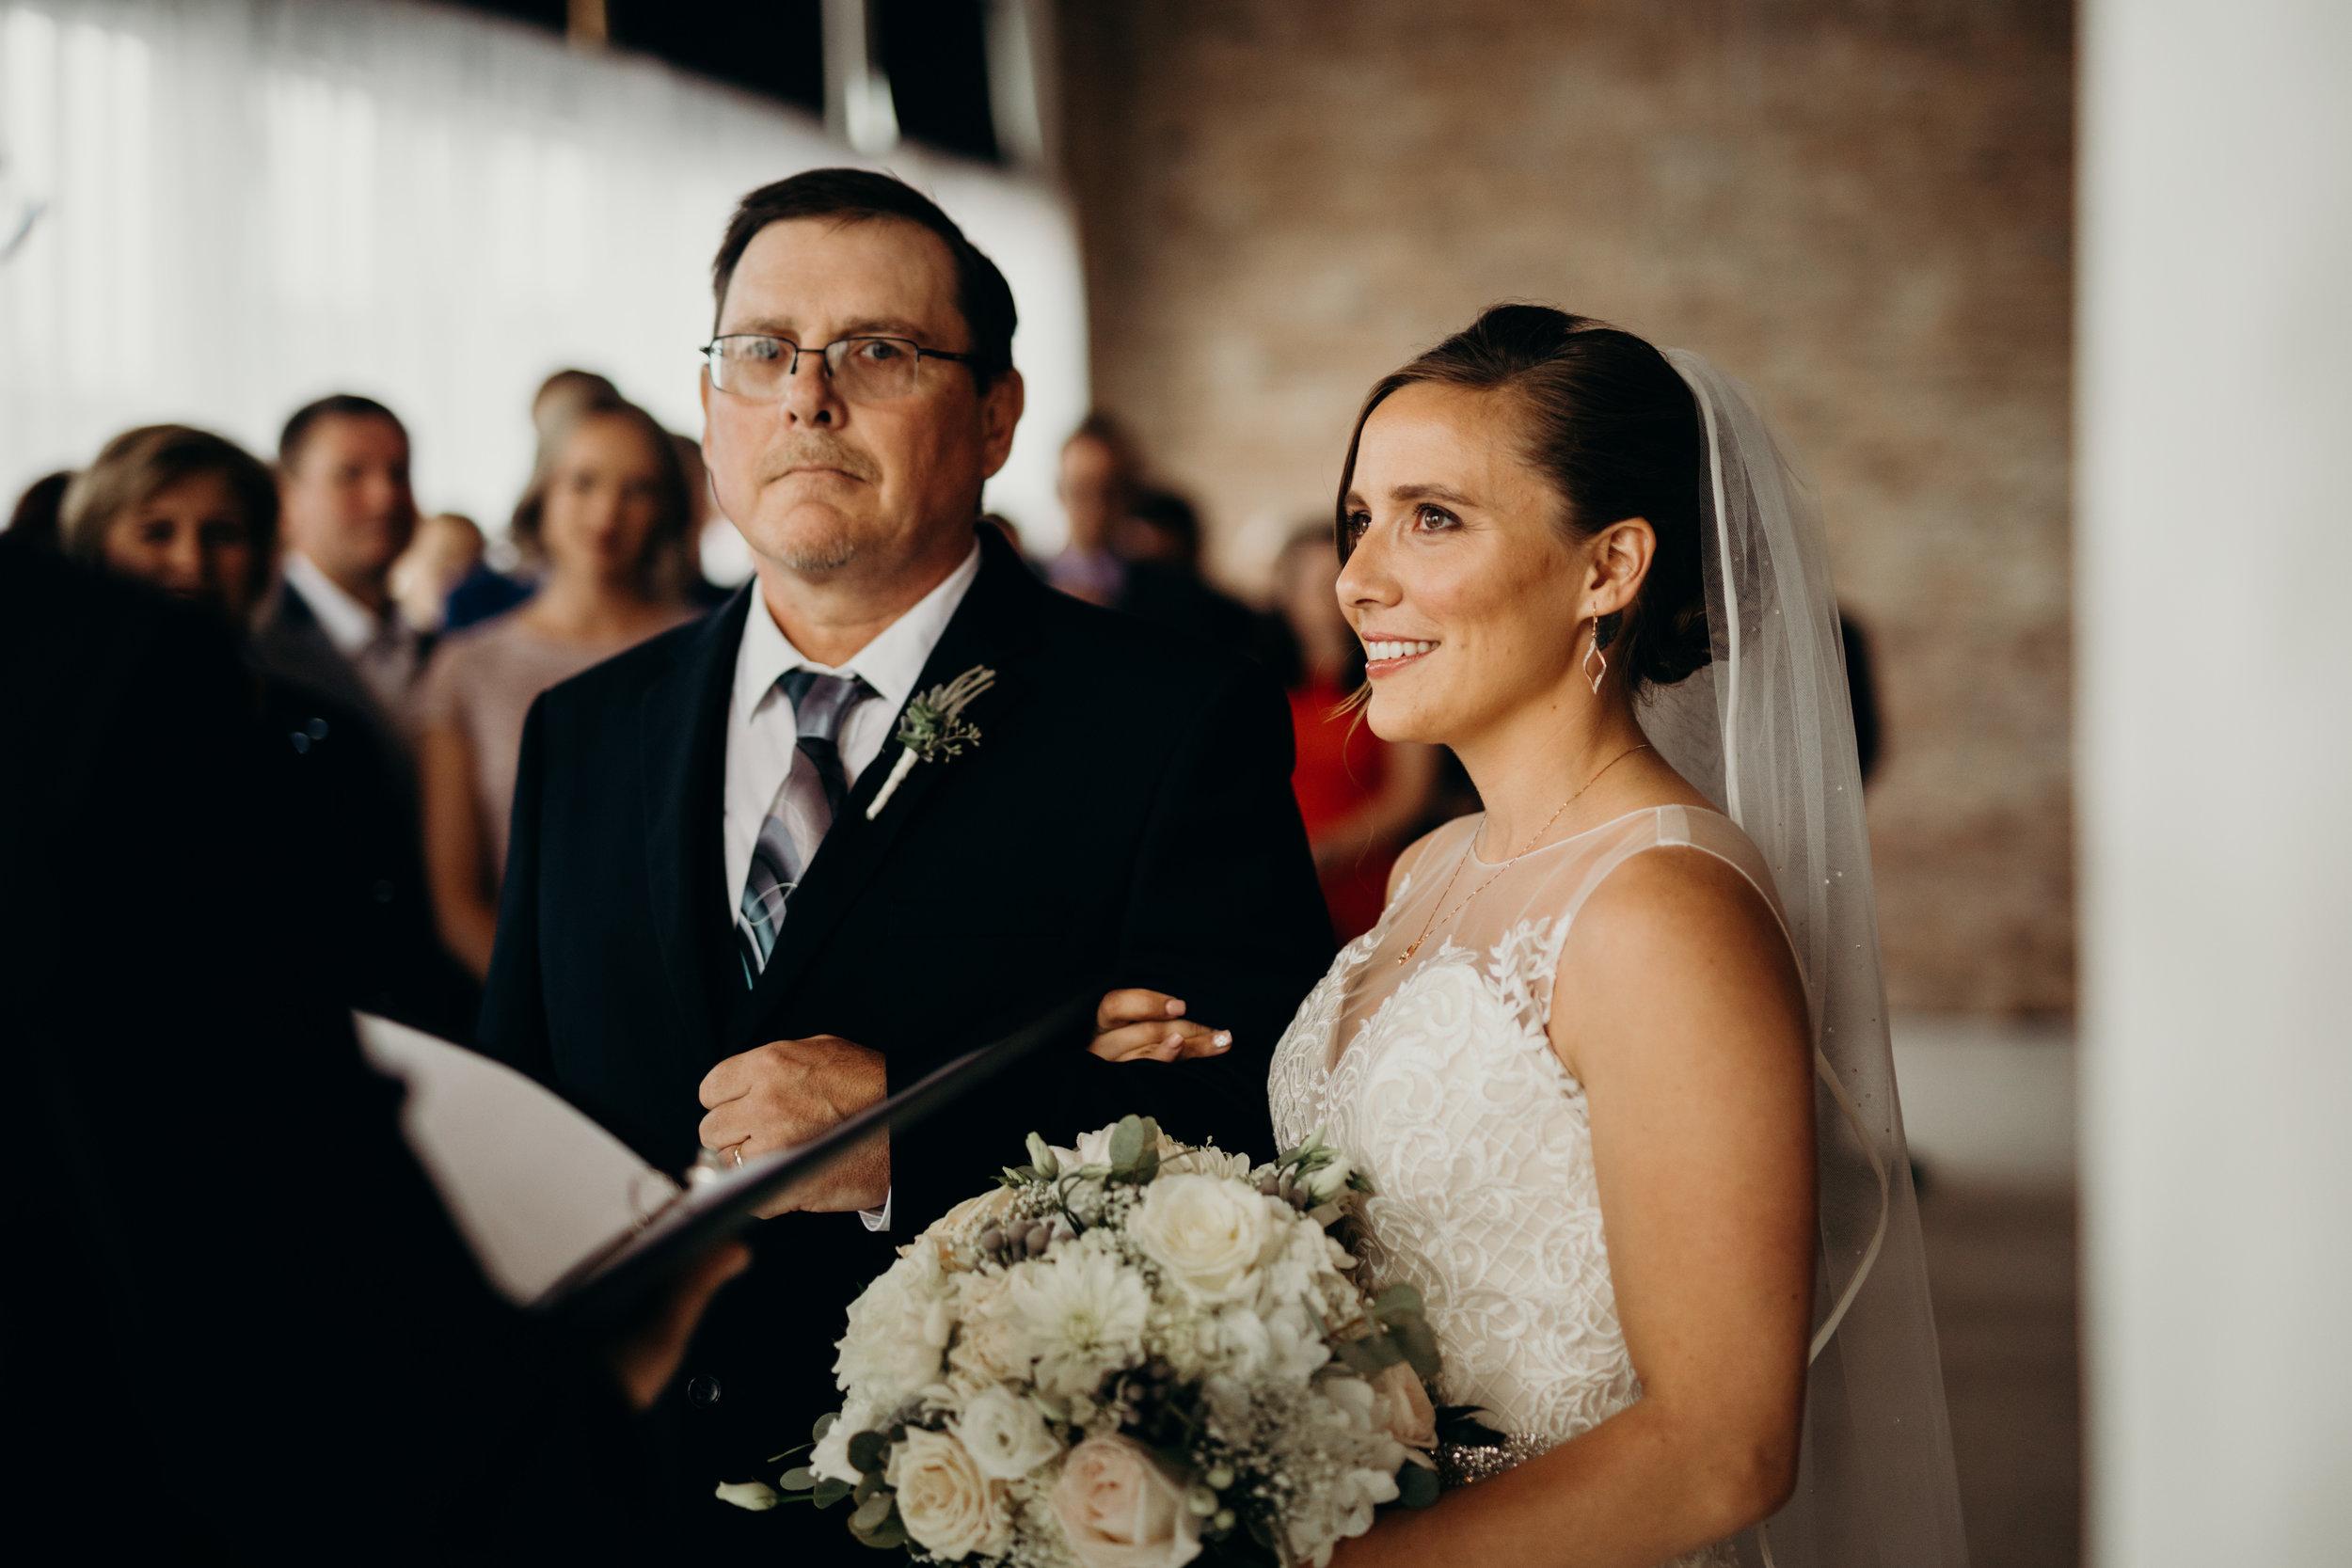 Vintage Wedding_Polly C Photography_20171726170944.jpg